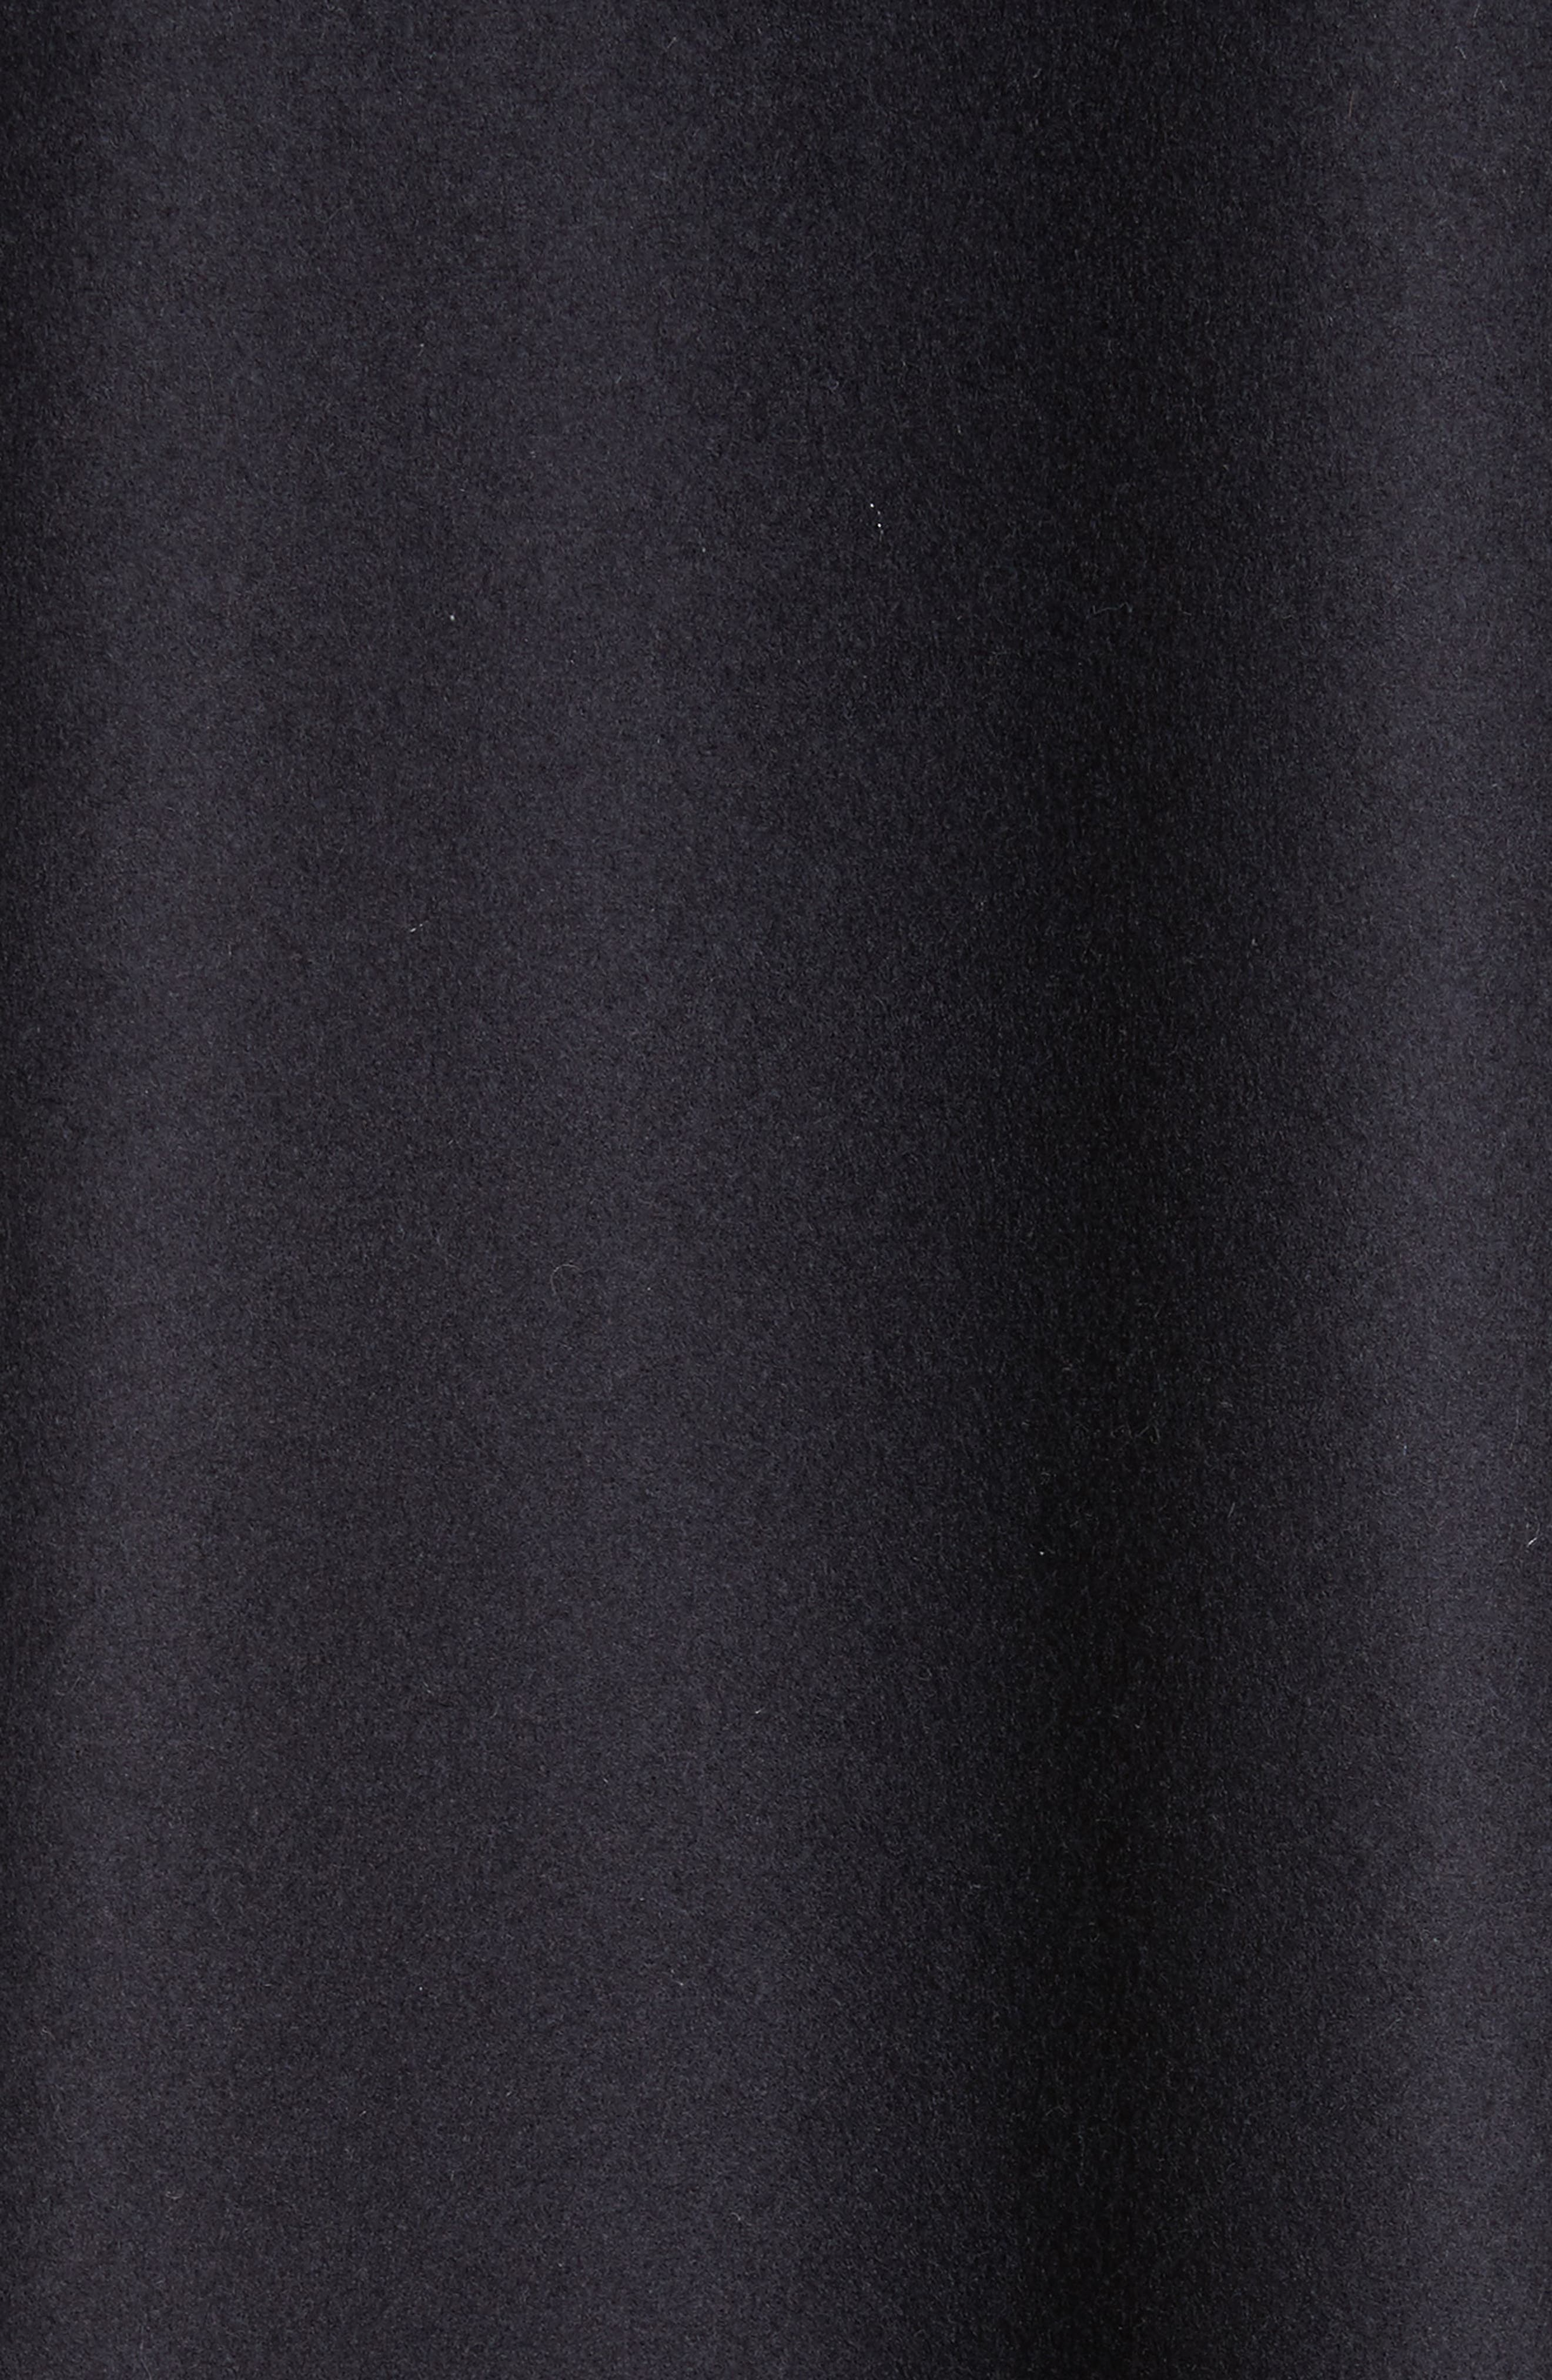 Grenat Wool & Cashmere Hooded Jacket,                             Alternate thumbnail 6, color,                             Navy